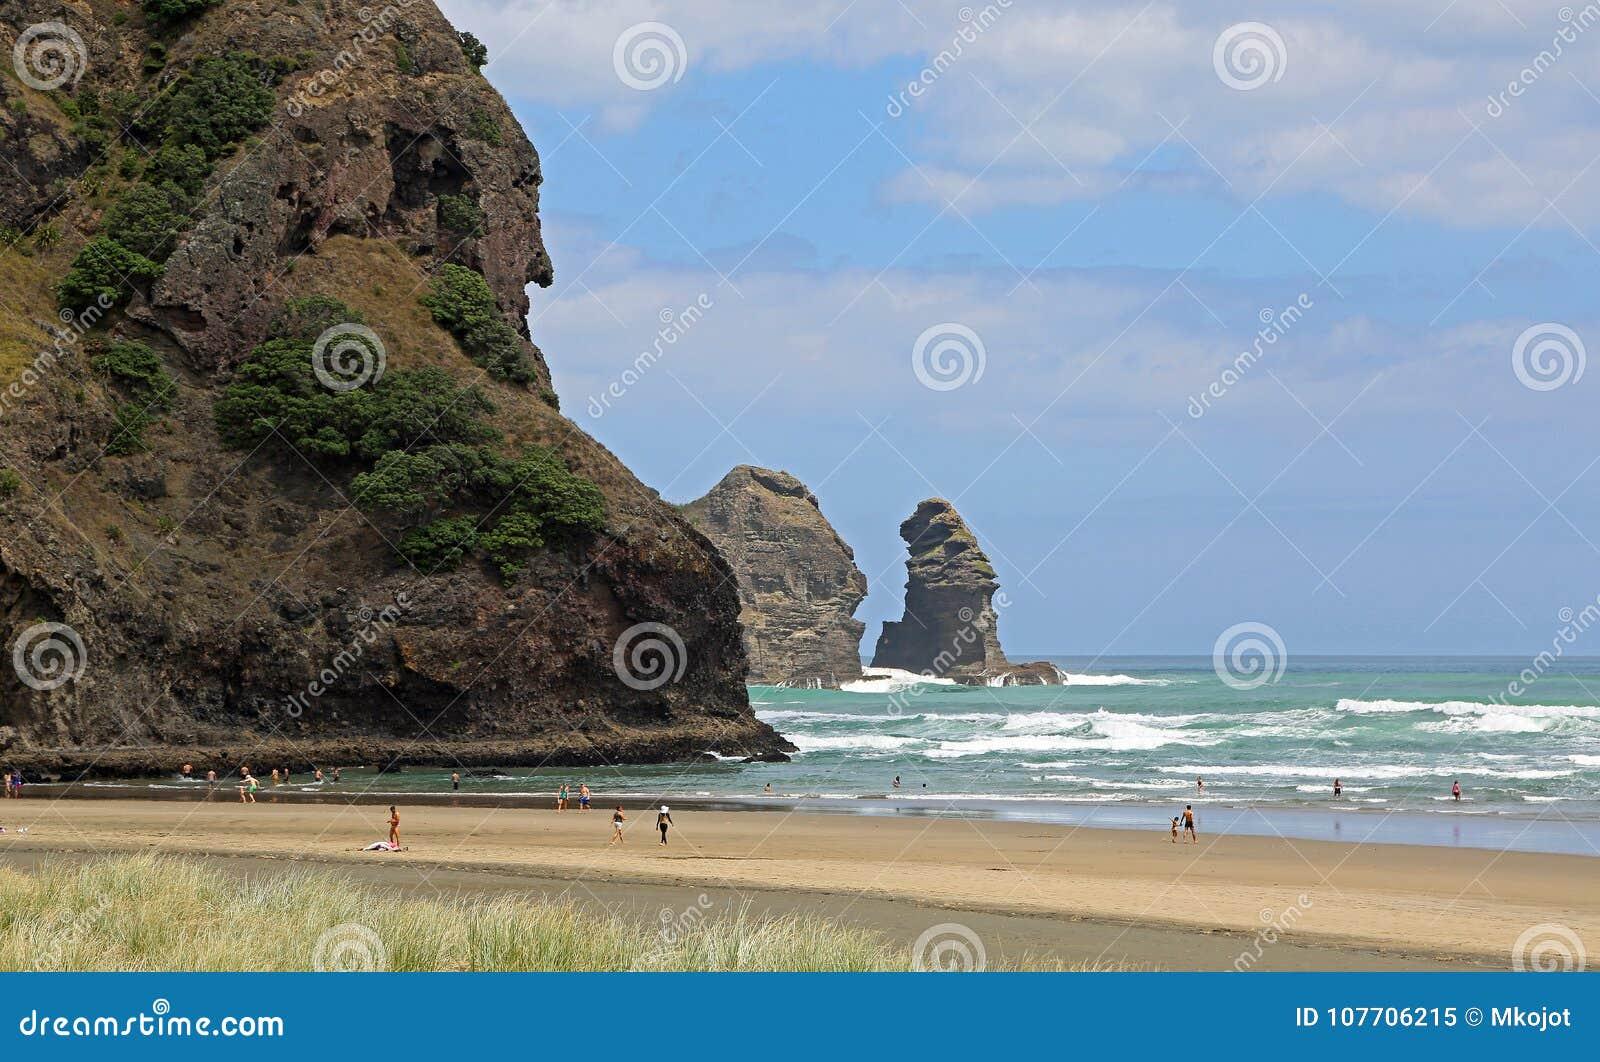 Recreation on Piha Beach